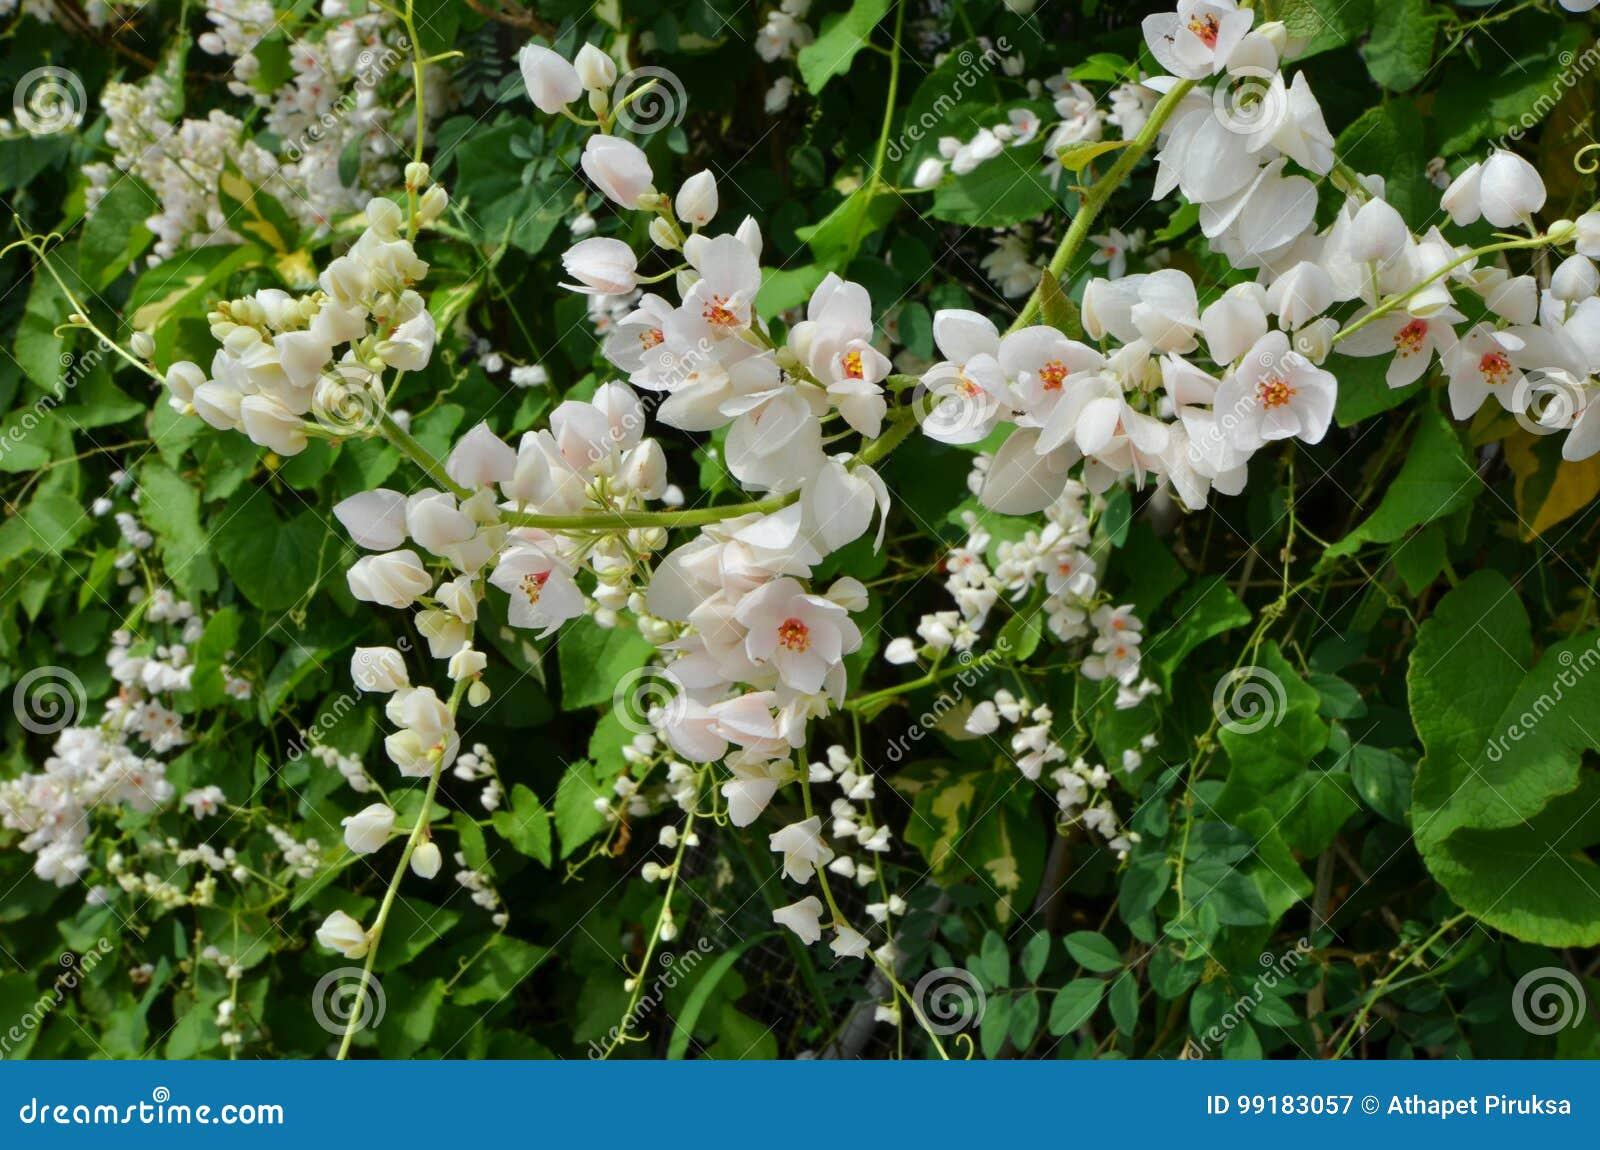 Beautiful white mexican creeper flowers stock image image of beautiful white mexican creeper flowers mightylinksfo